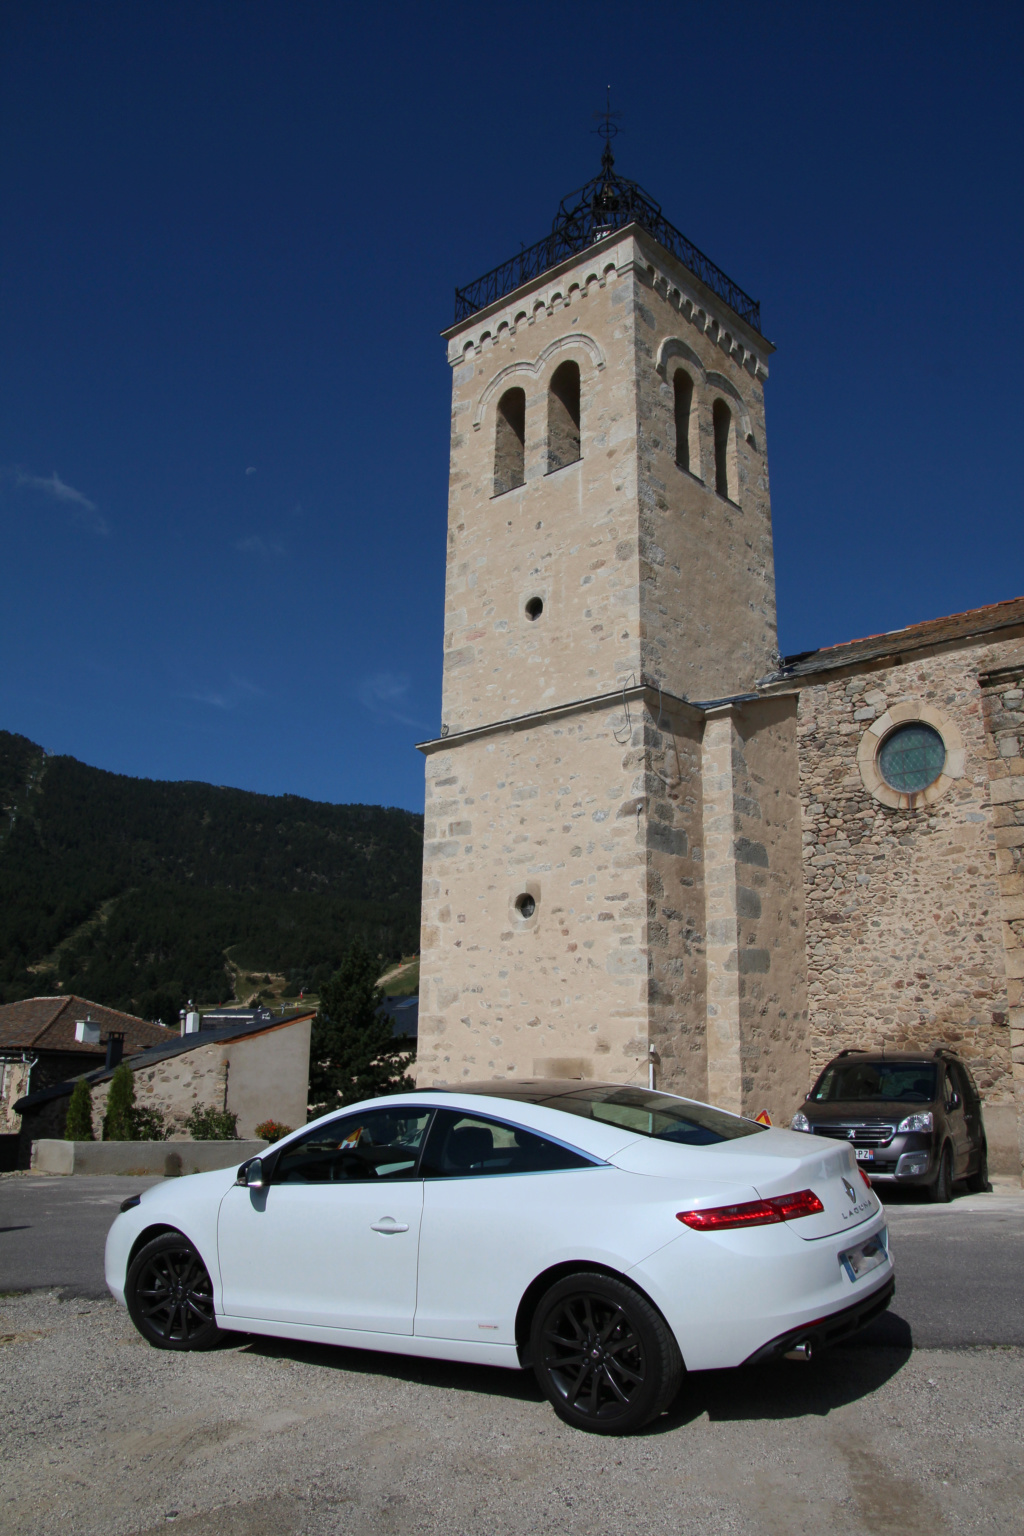 [Laurent66] LAGUNA III.2 Coupé 2.0 dCi 175 cv GP Monaco Bose Img_6814